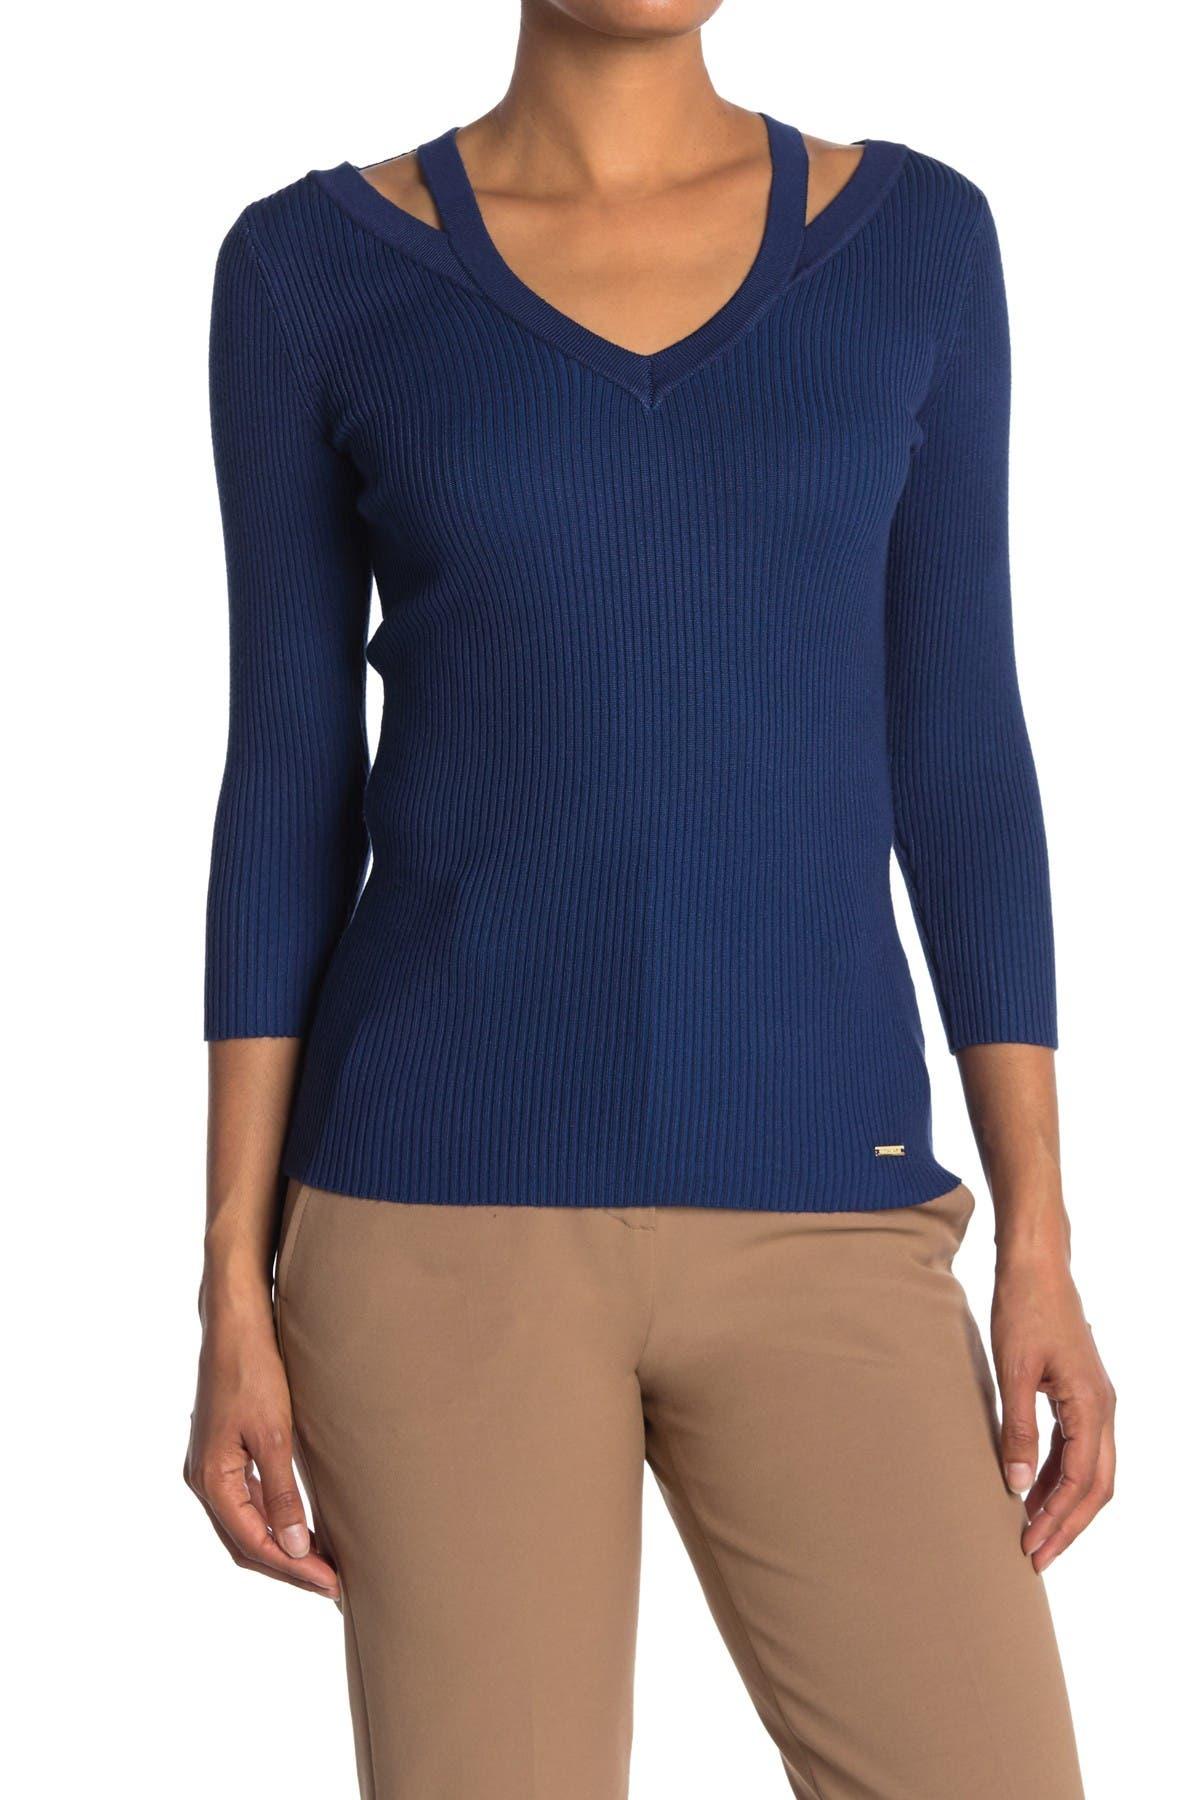 Image of T Tahari 3/4 Sleeve V-Neck Cutout Pullover